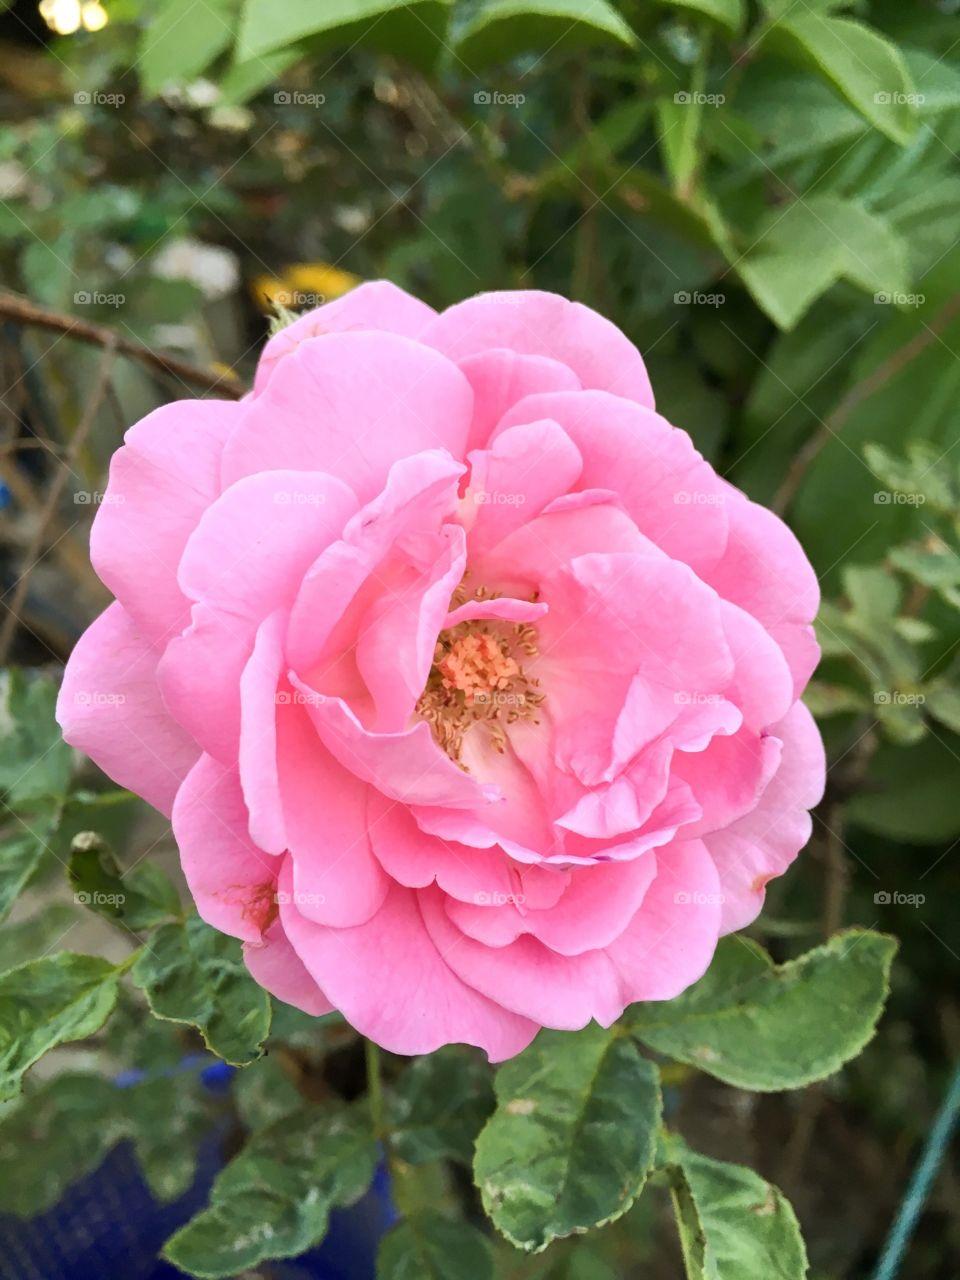 Pink rose flower in nature garden